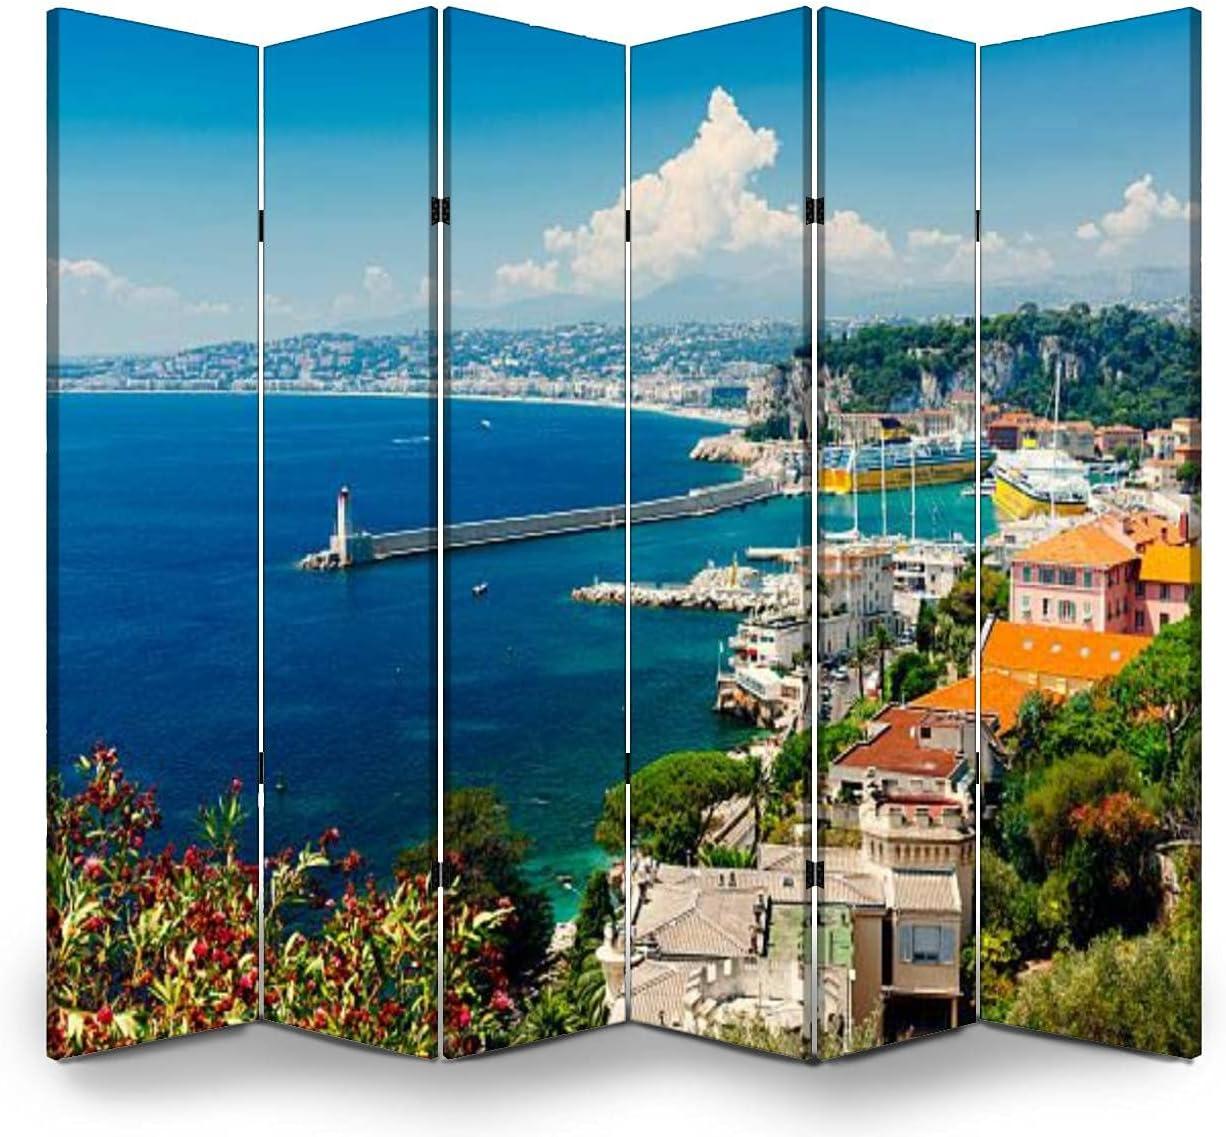 Dola-Dola 6 Panel Screen Room France Foldin Nice Divider Sale Attention brand price Harbour